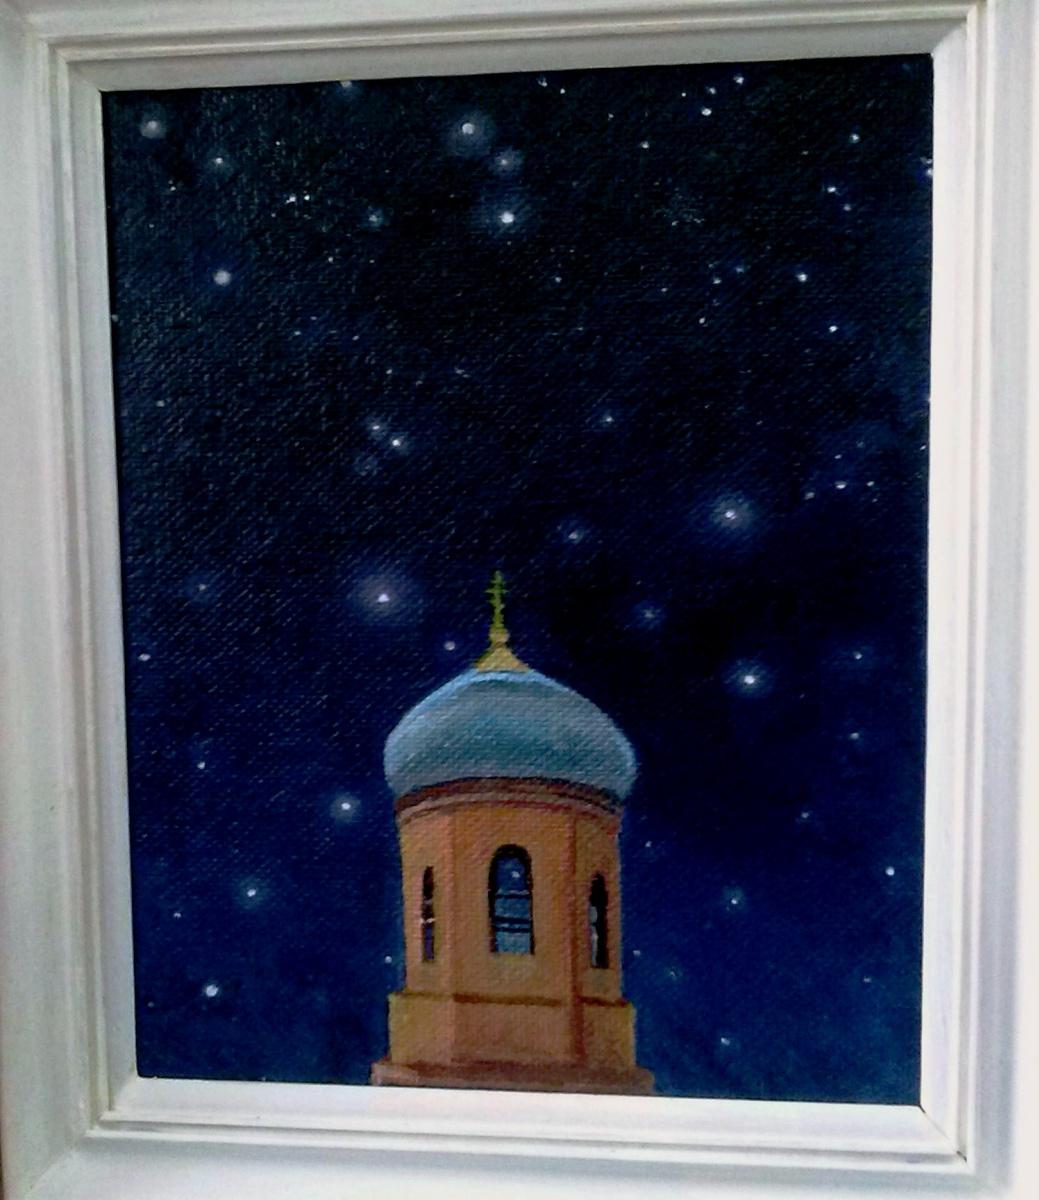 Nikolay Dmitrievich Pushkarev. The eternity of the universe